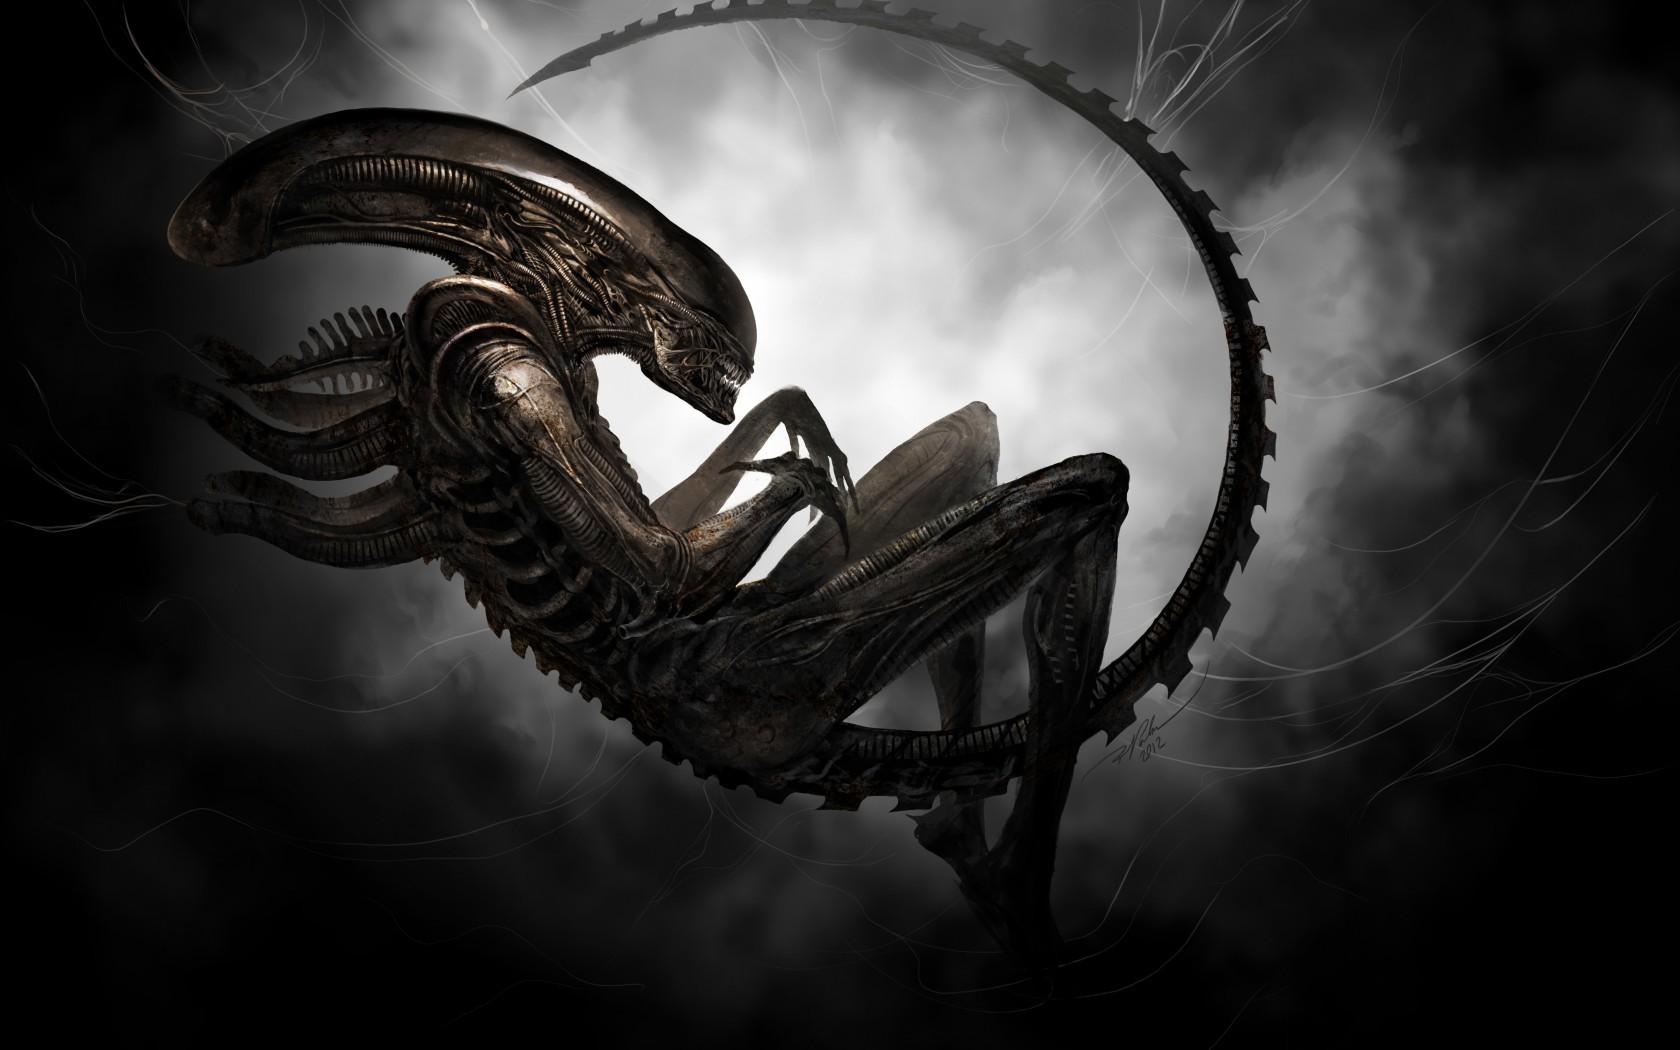 Baixar papel de parede para celular de Cinema, Alienígena gratuito.